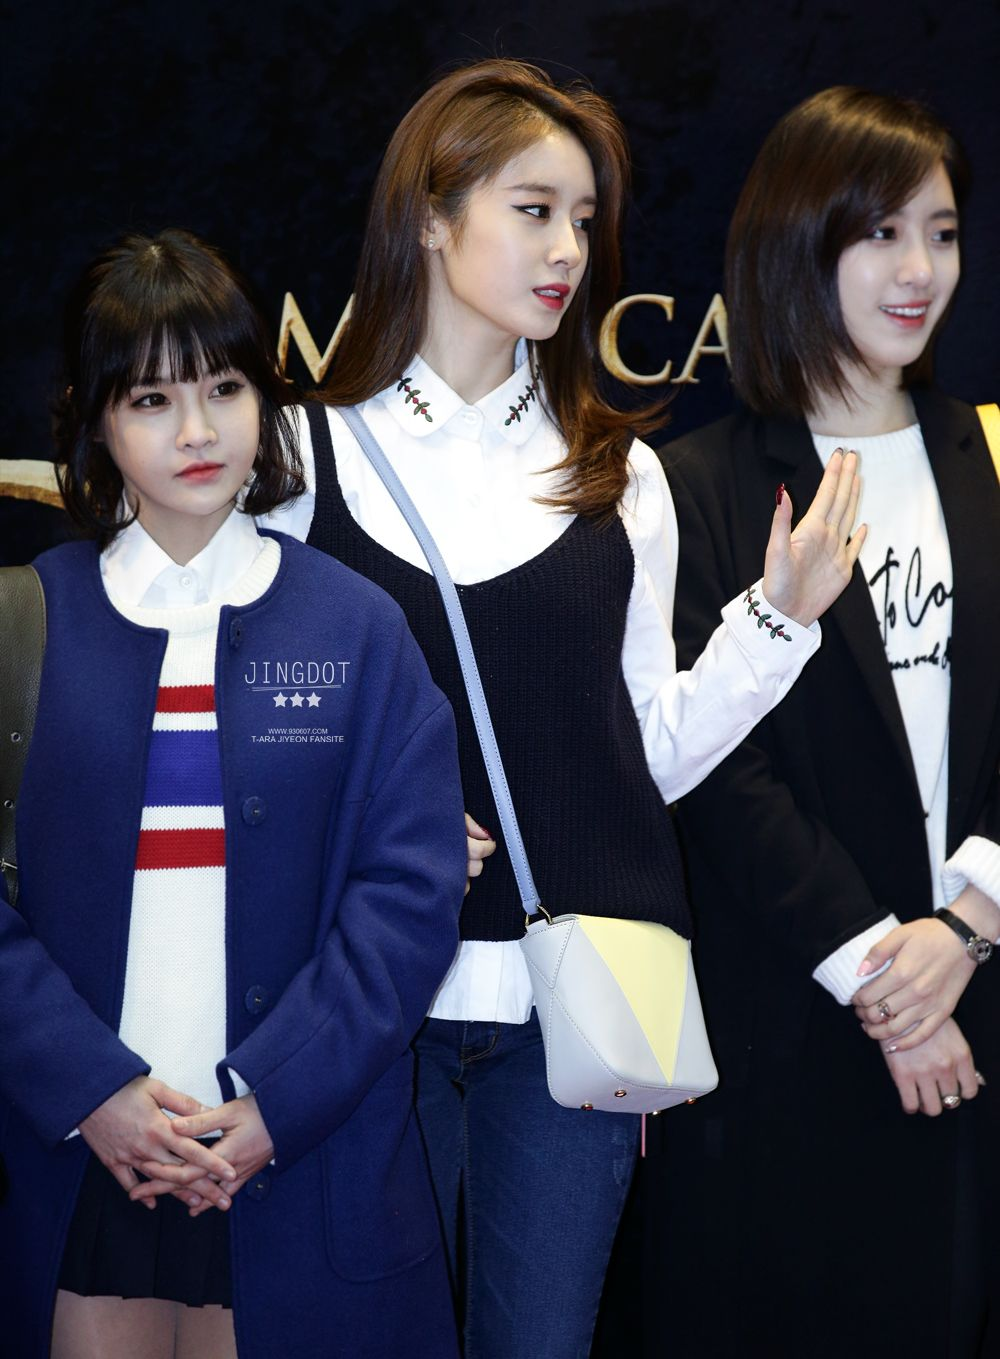 Boram, Jiyeon and Eunjung [Studio K] It seems like Boram is the daughter of Jiyeon :D